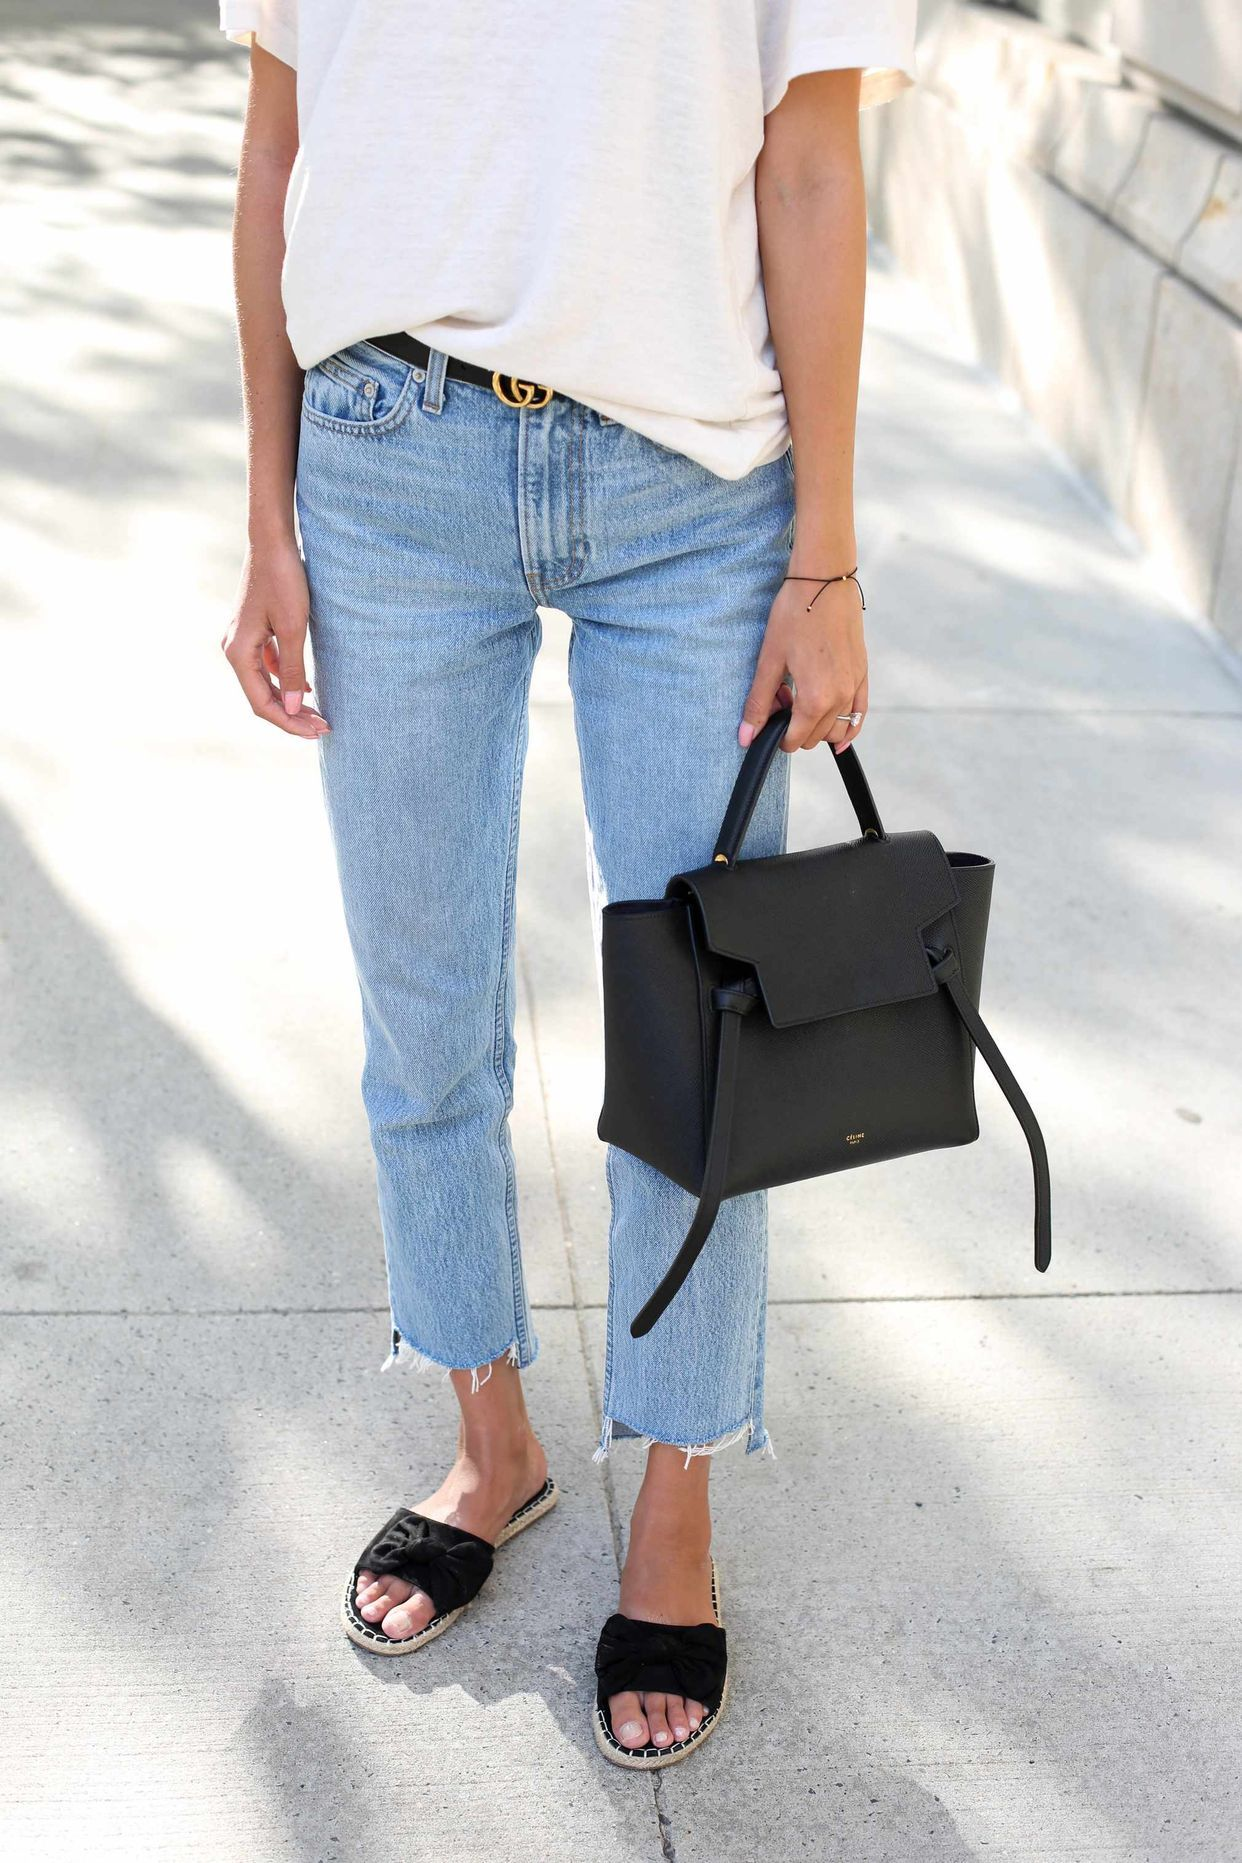 effortless cut off jeans, half tucked t-shirt, boxy handbag, black slide ons